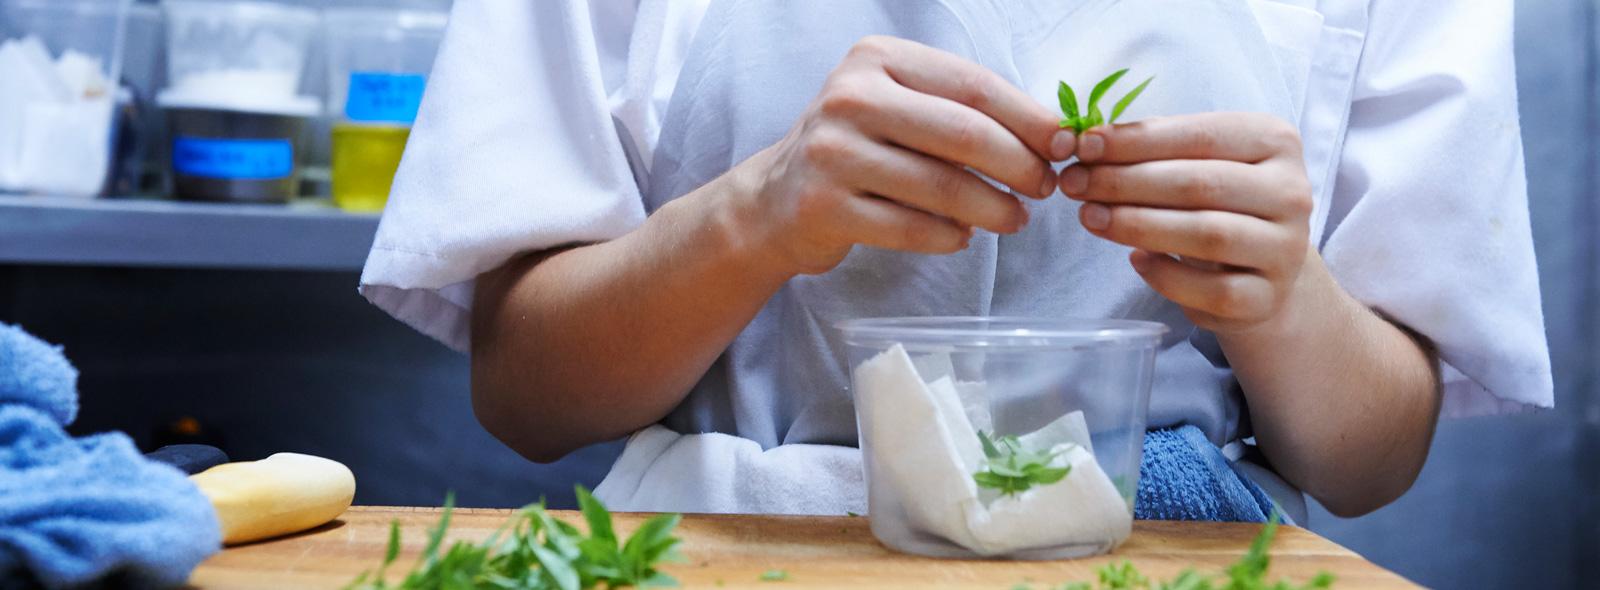 Sidney Street Café - Herbs